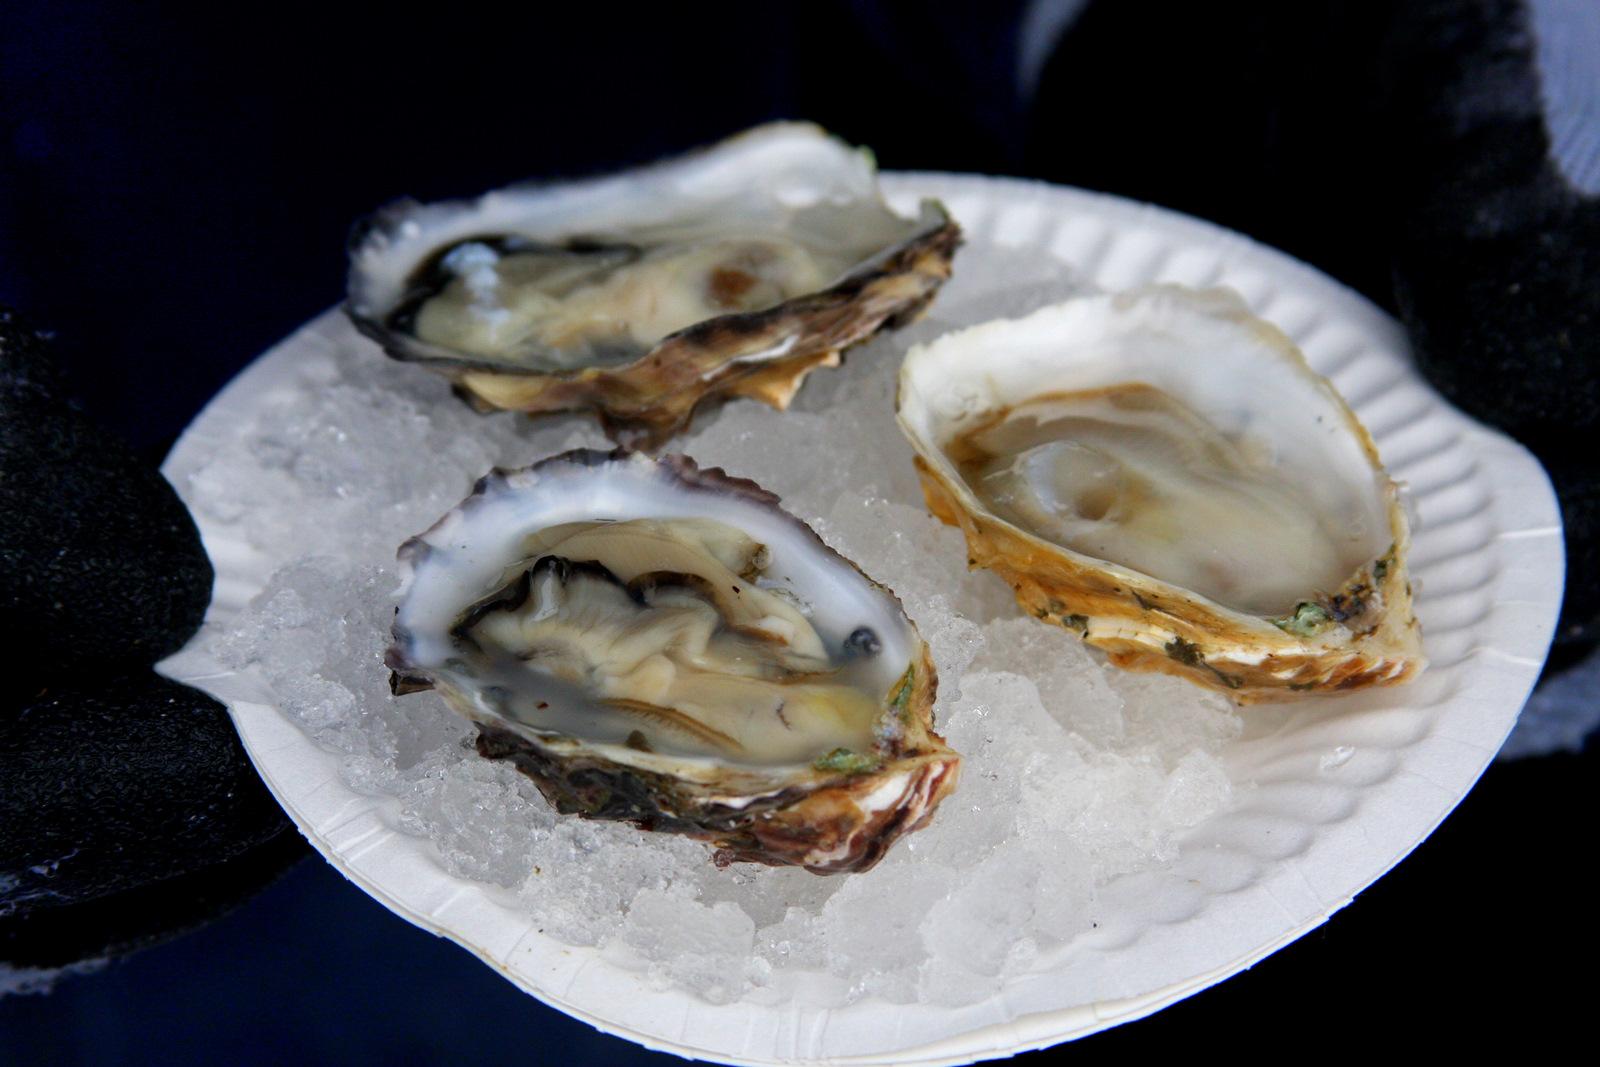 Суша и суши: морепродукты как жемчужина Лос-Анджелеса